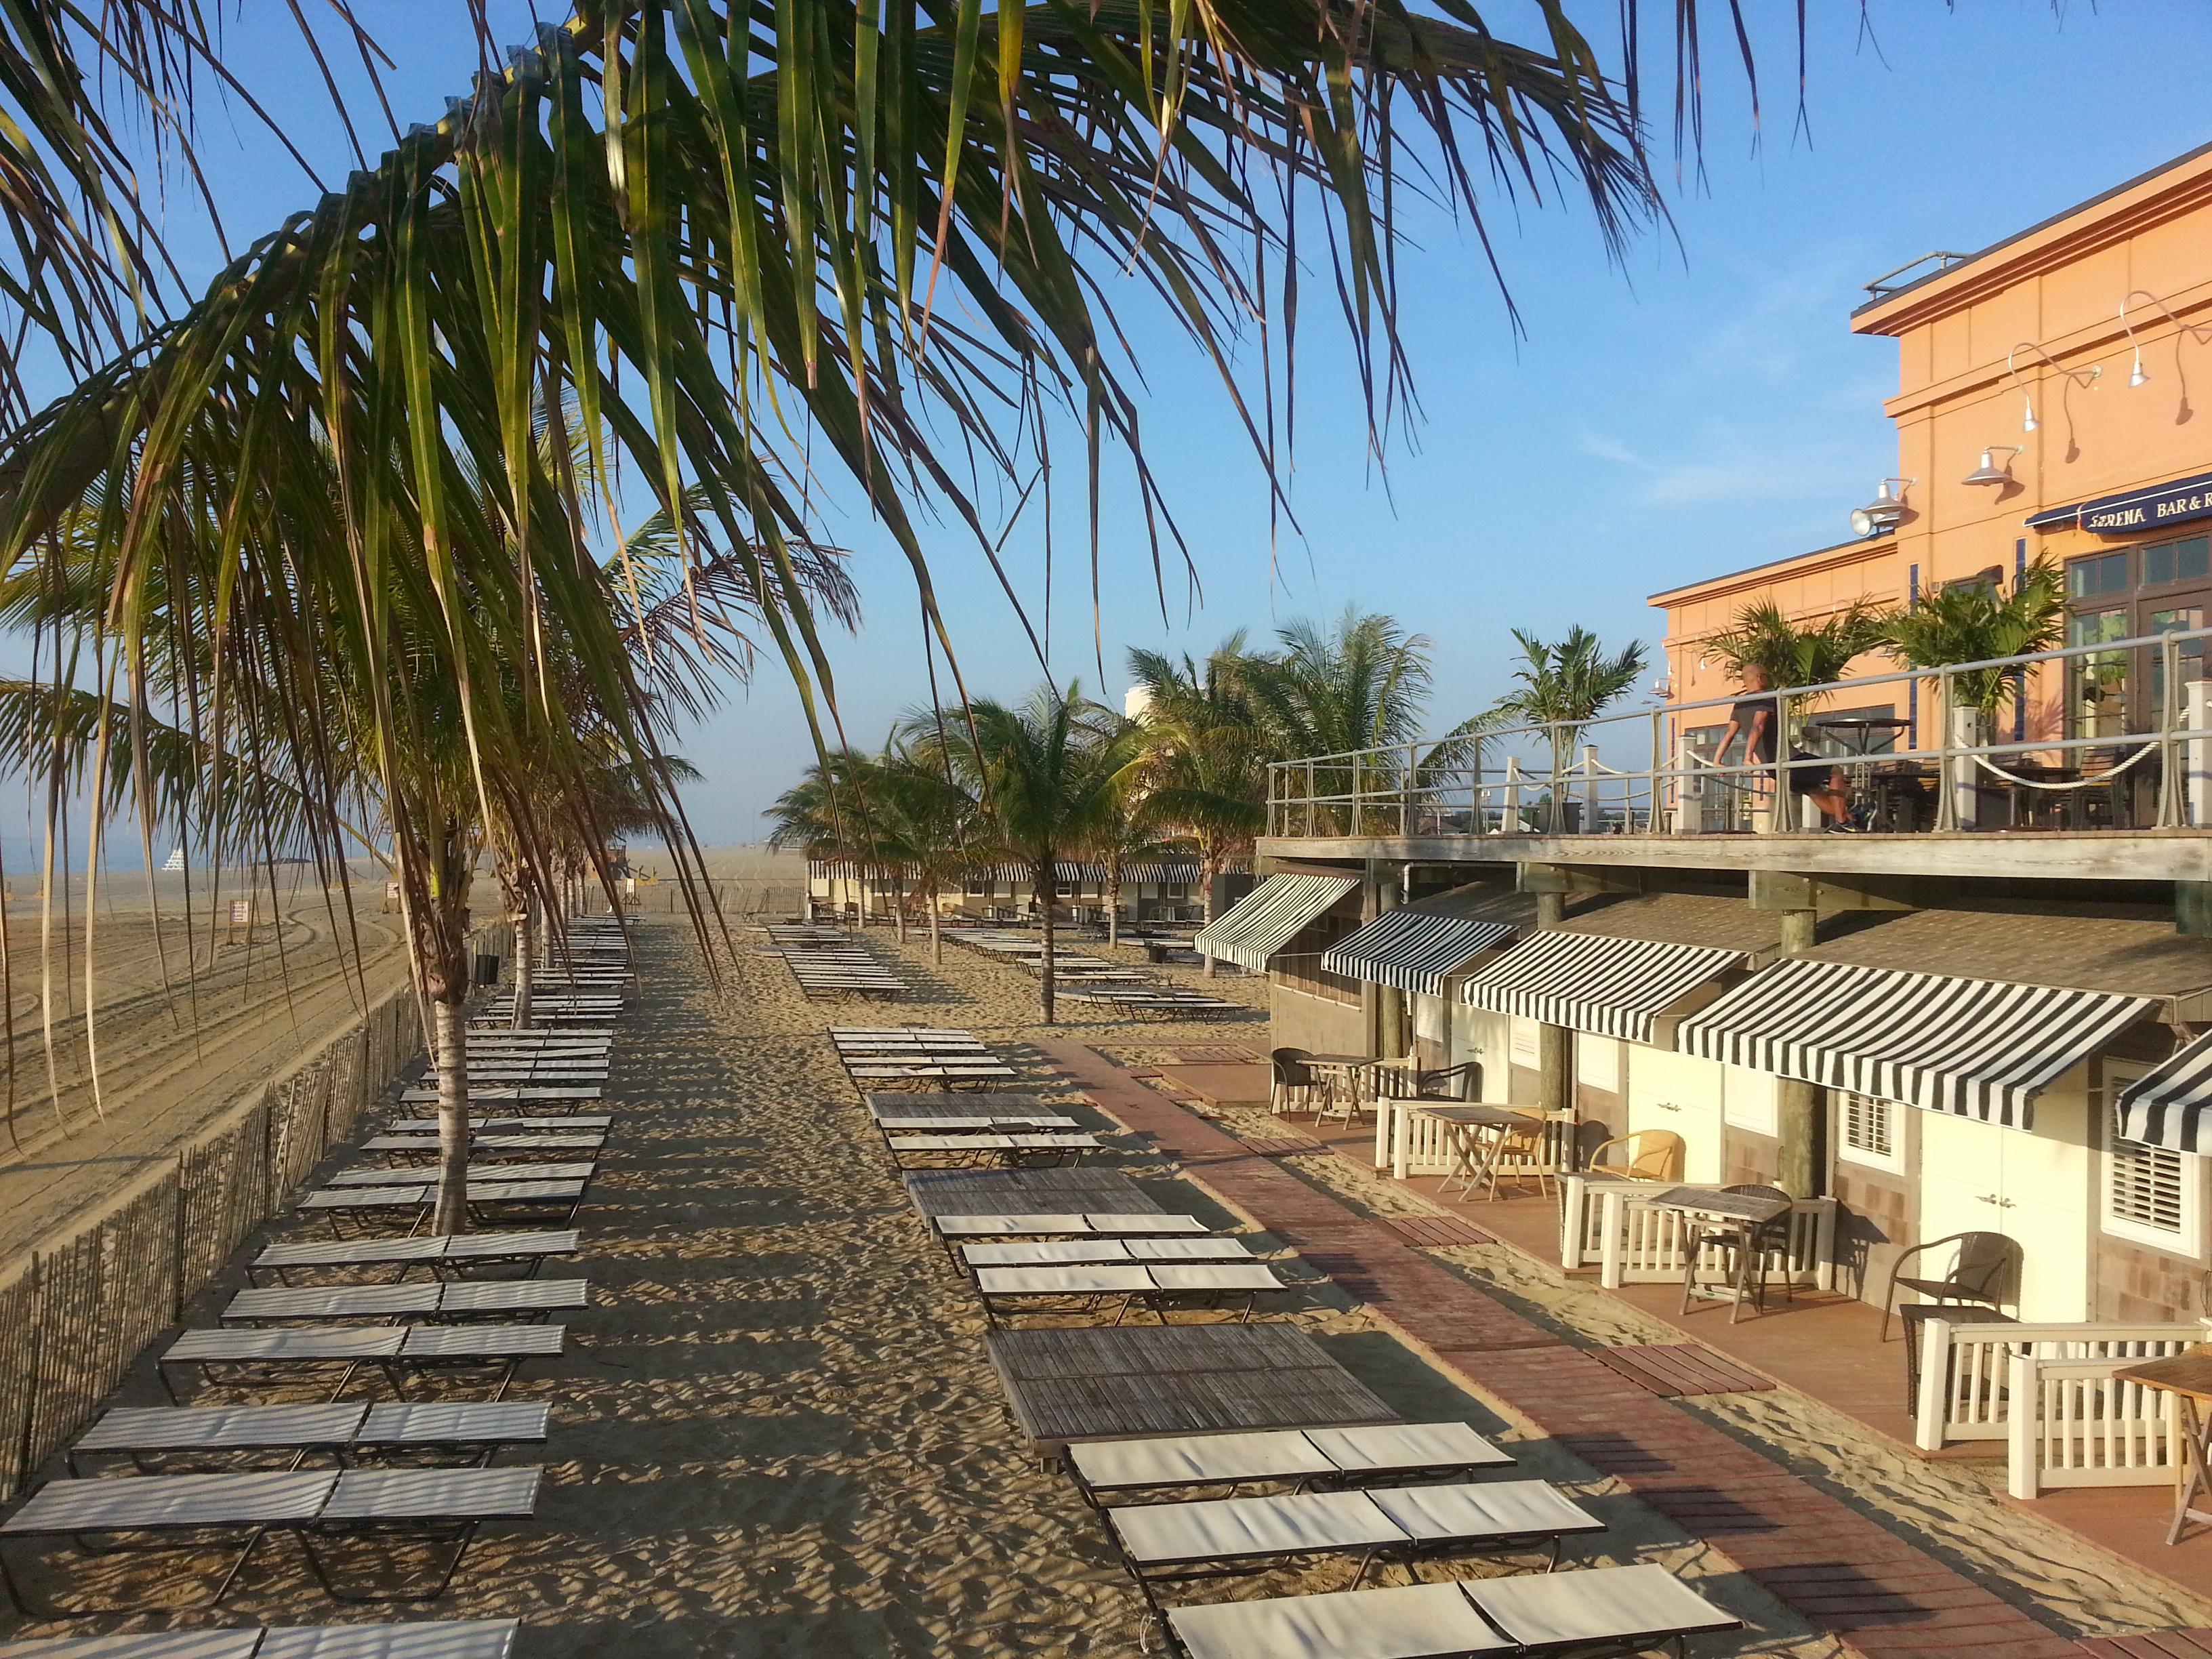 LeClub, the Pier Village beach club is a short walk away from 55 Melrose.